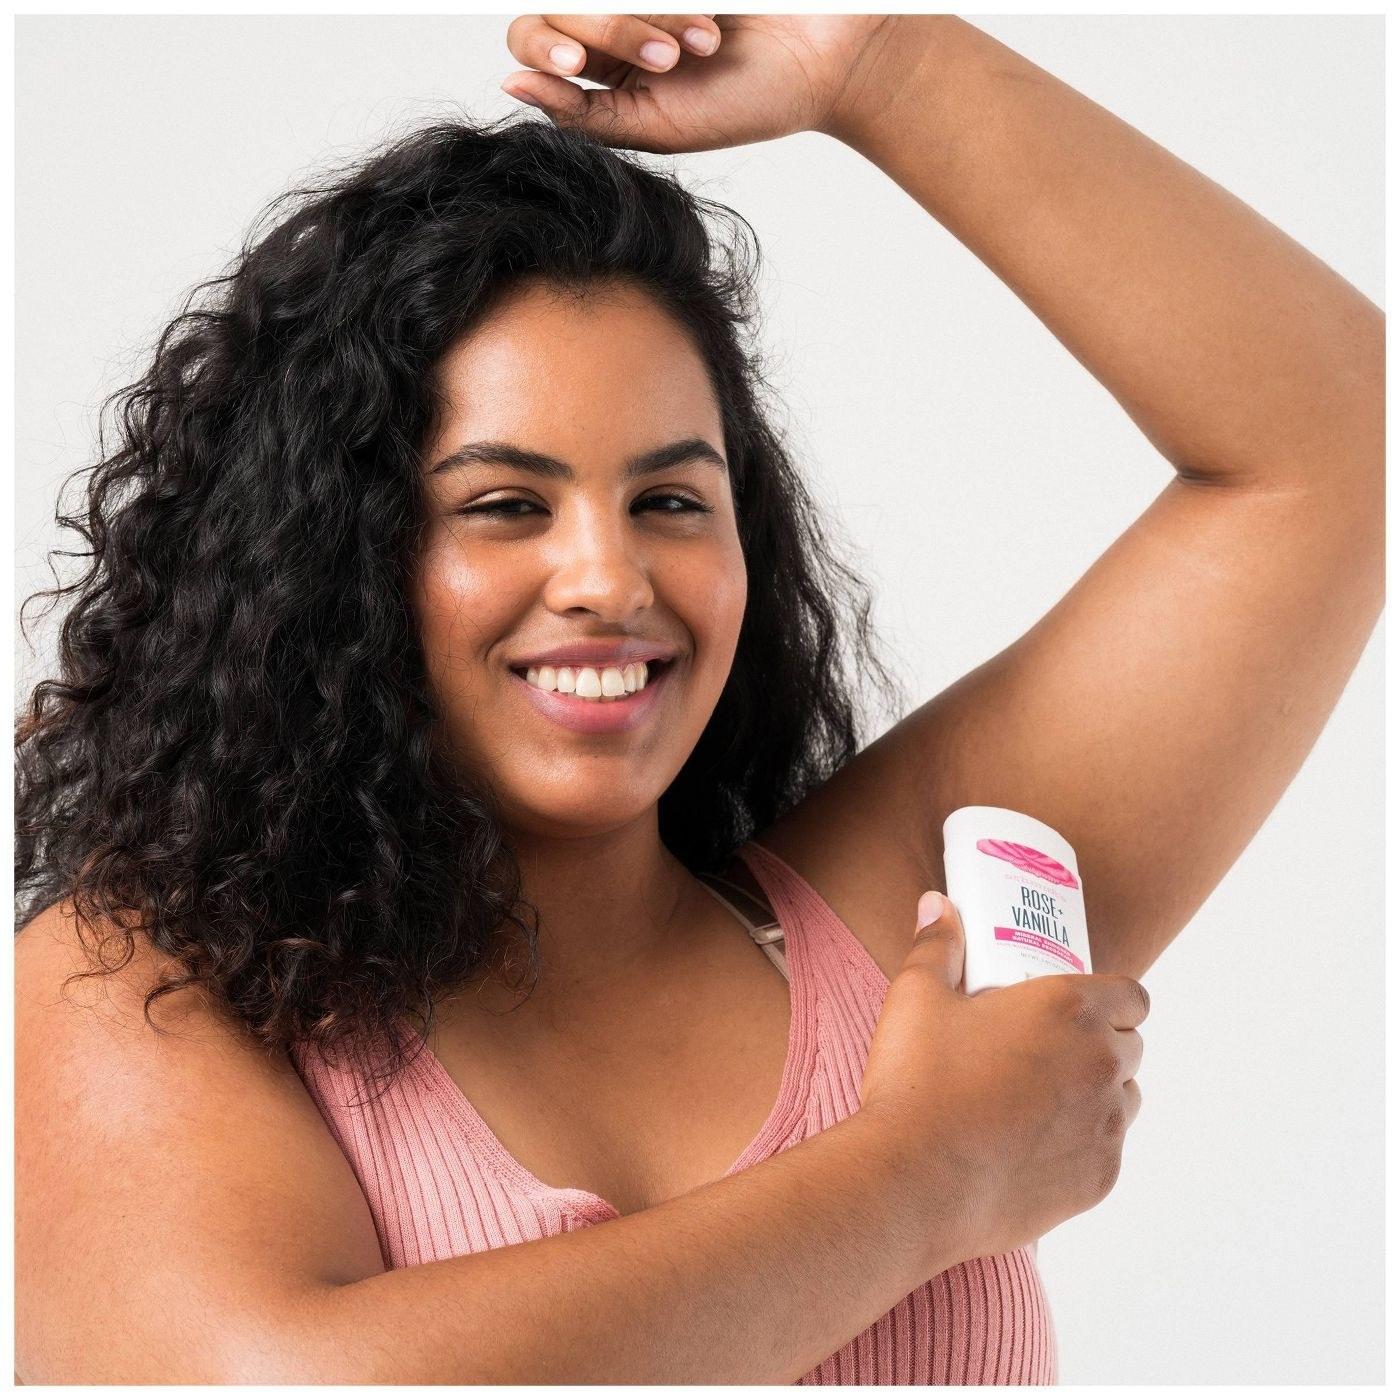 Model applying deodorant